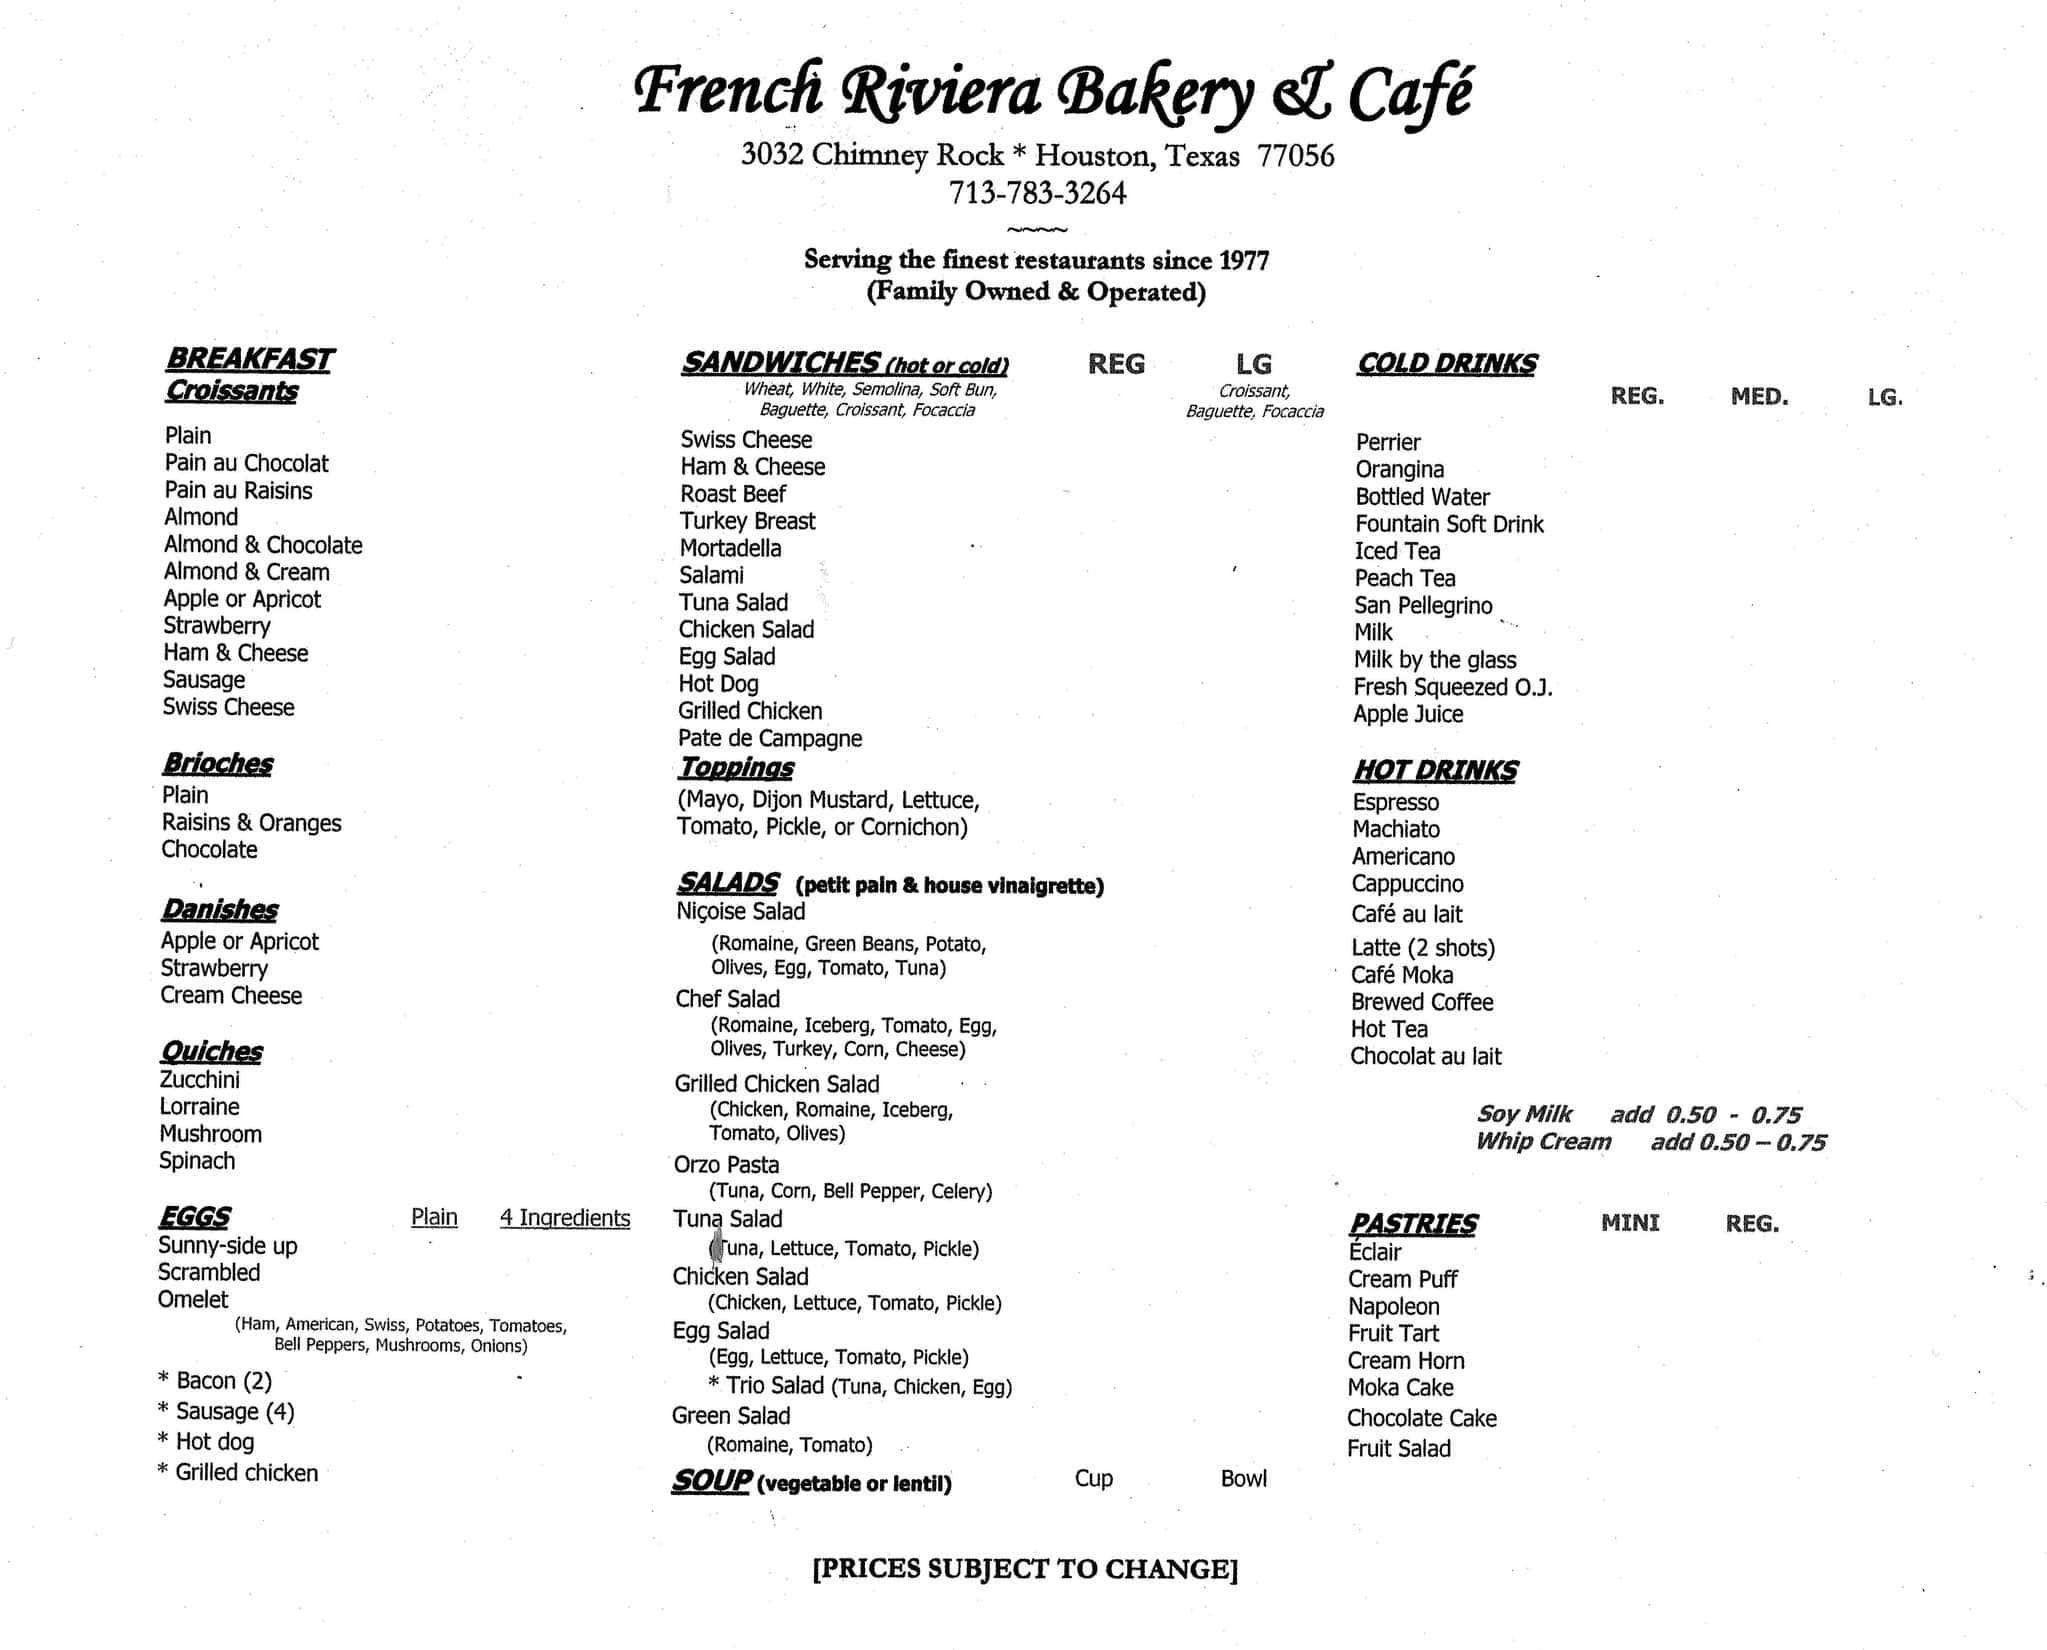 french riviera bakery & cafe, galleria, houston - urbanspoon/zomato